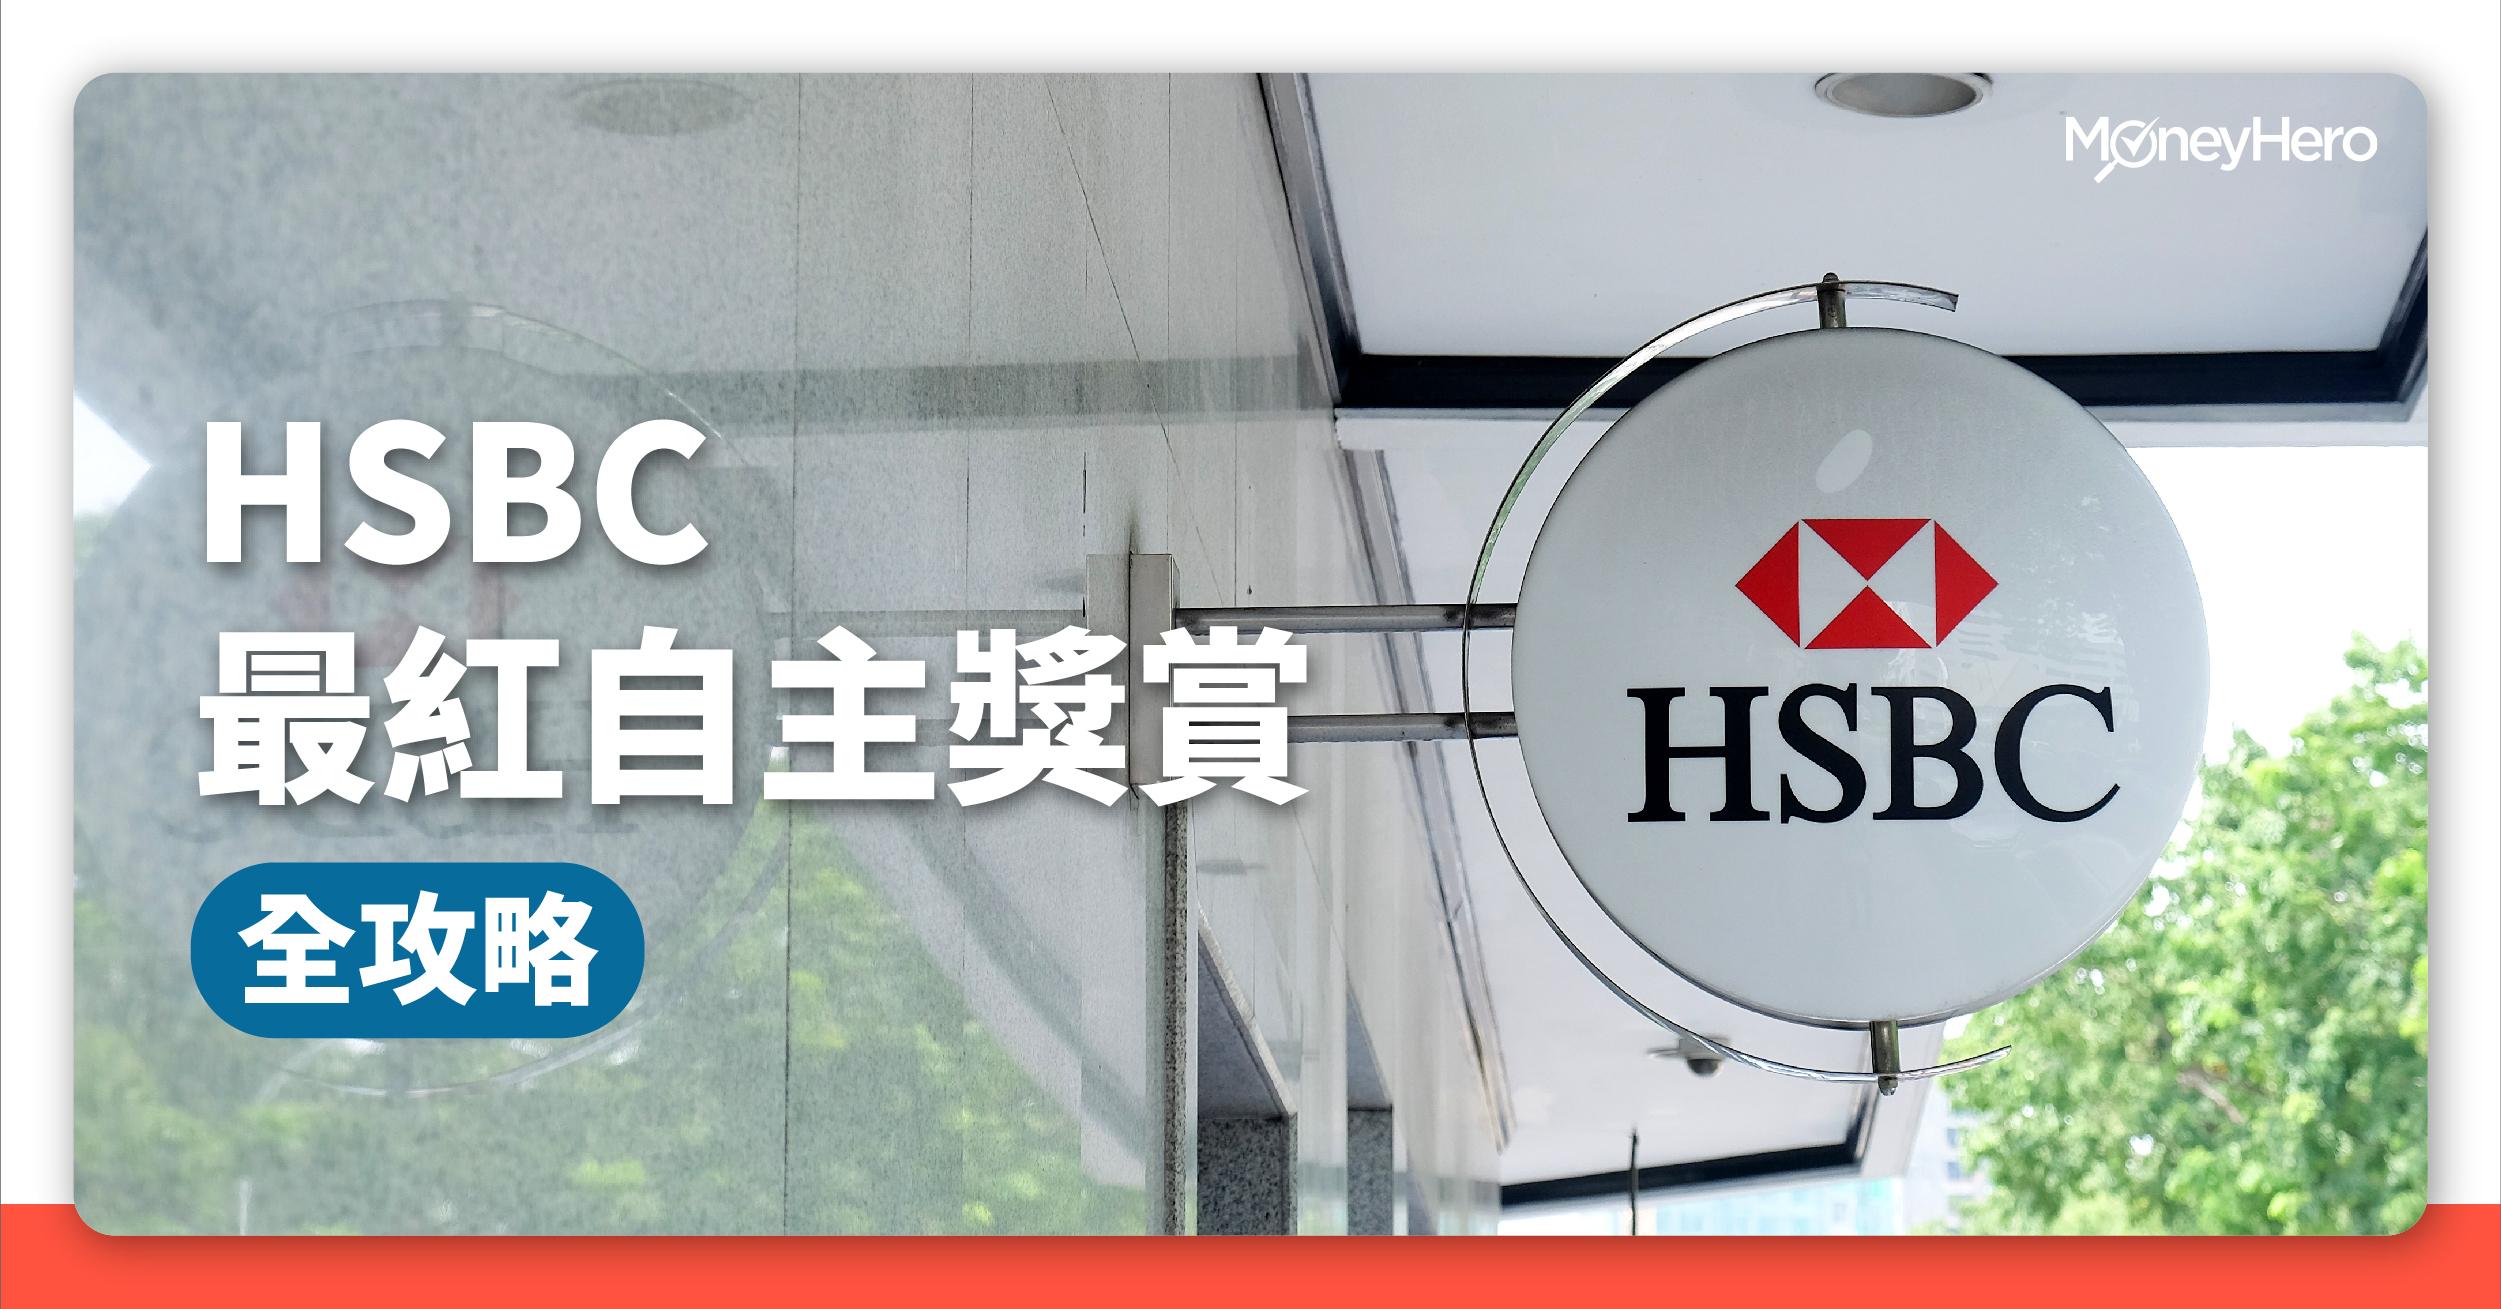 HSBC 最紅自主獎賞 全攻略